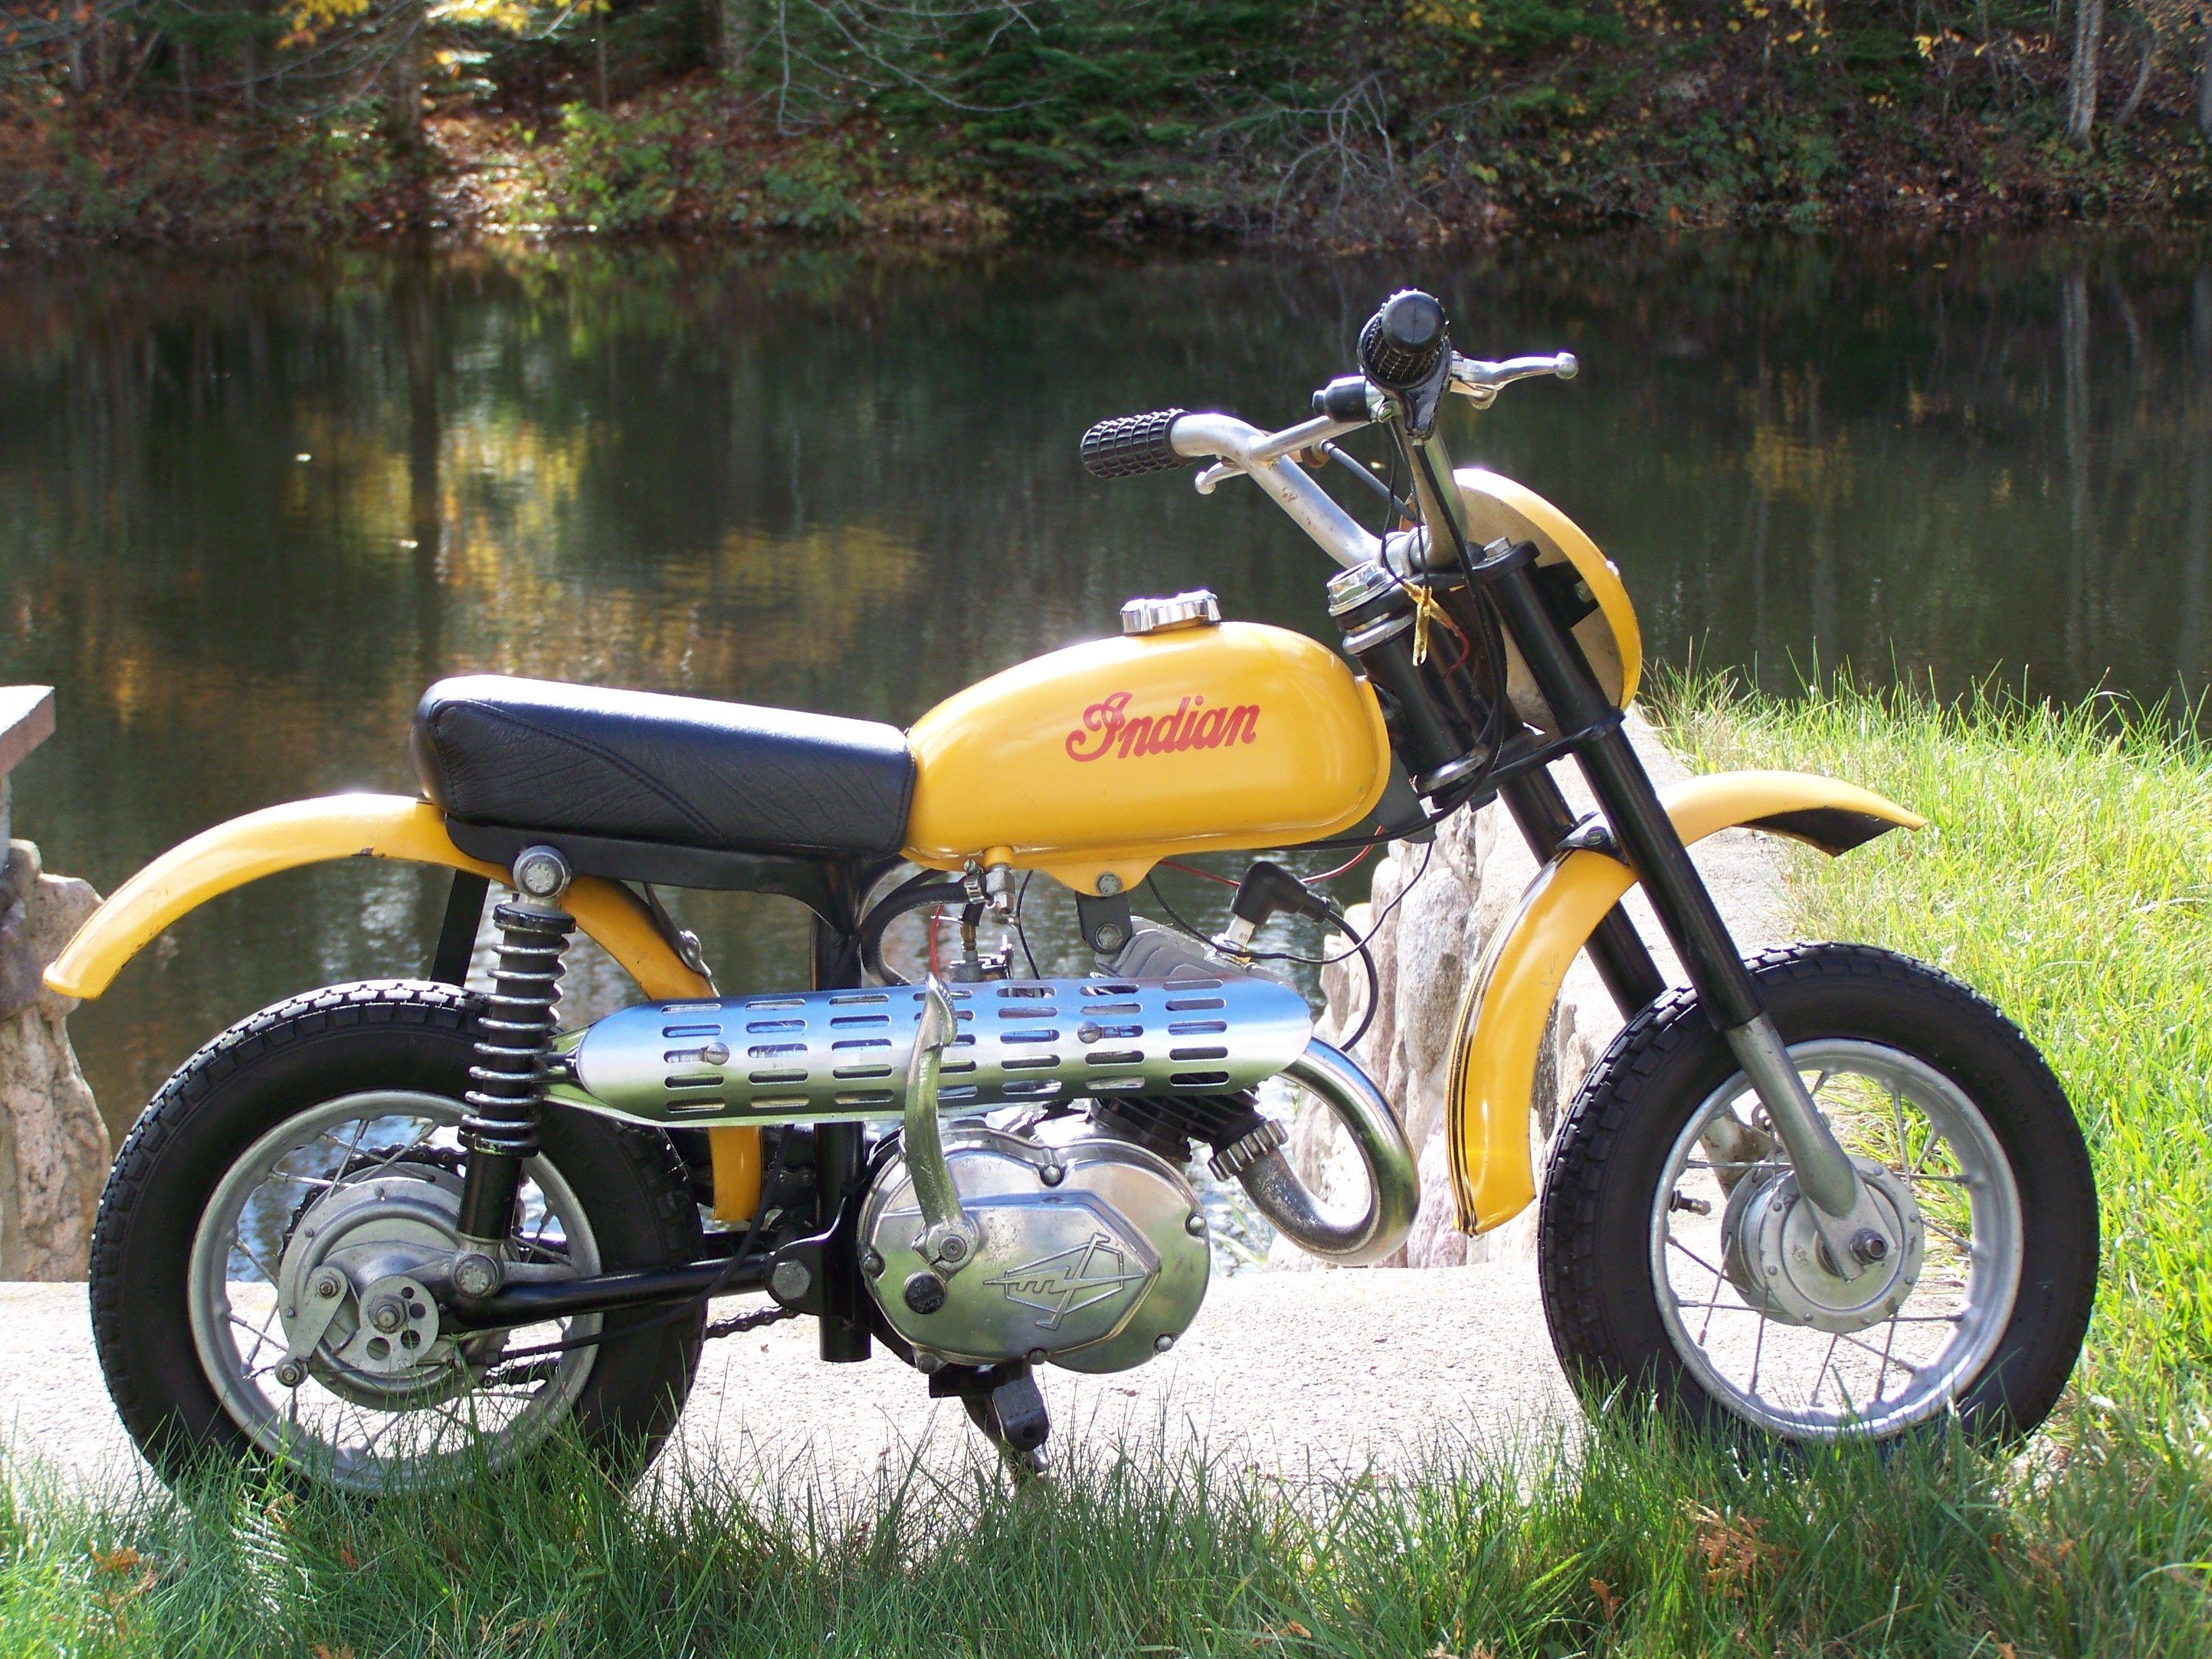 1969 Indian Mm5a Mini Bambino 49cc Mini Bike Vintage Motorcycles Beautiful Bike